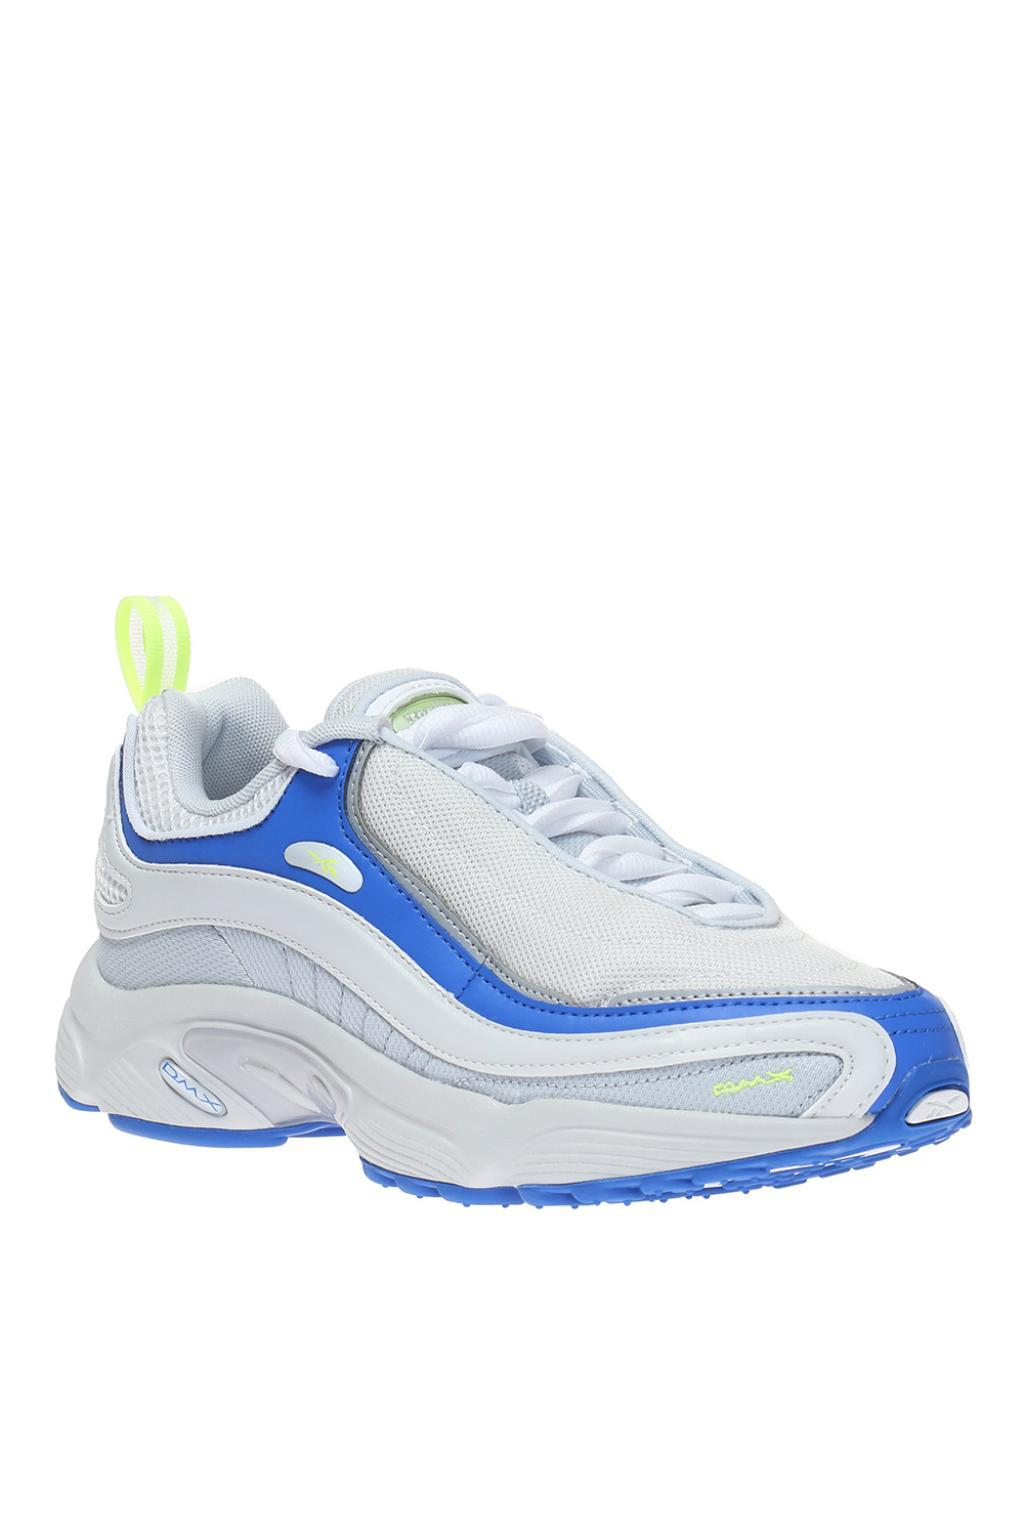 c4e77118eb23 Reebok  daytona Dmx  Sport Shoes in White for Men - Lyst